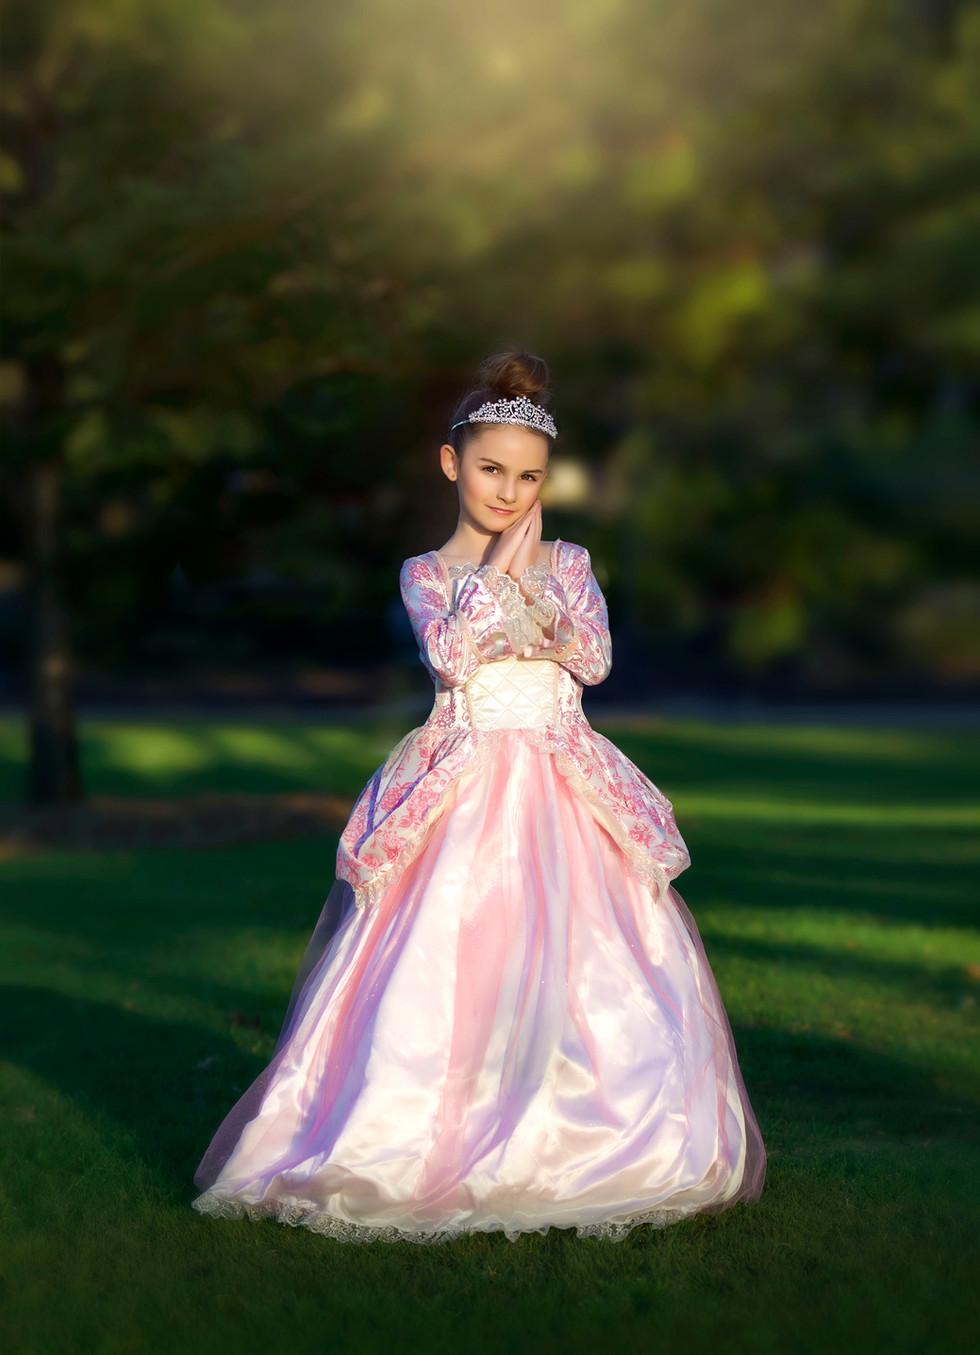 beautiful childrens photos newcastle